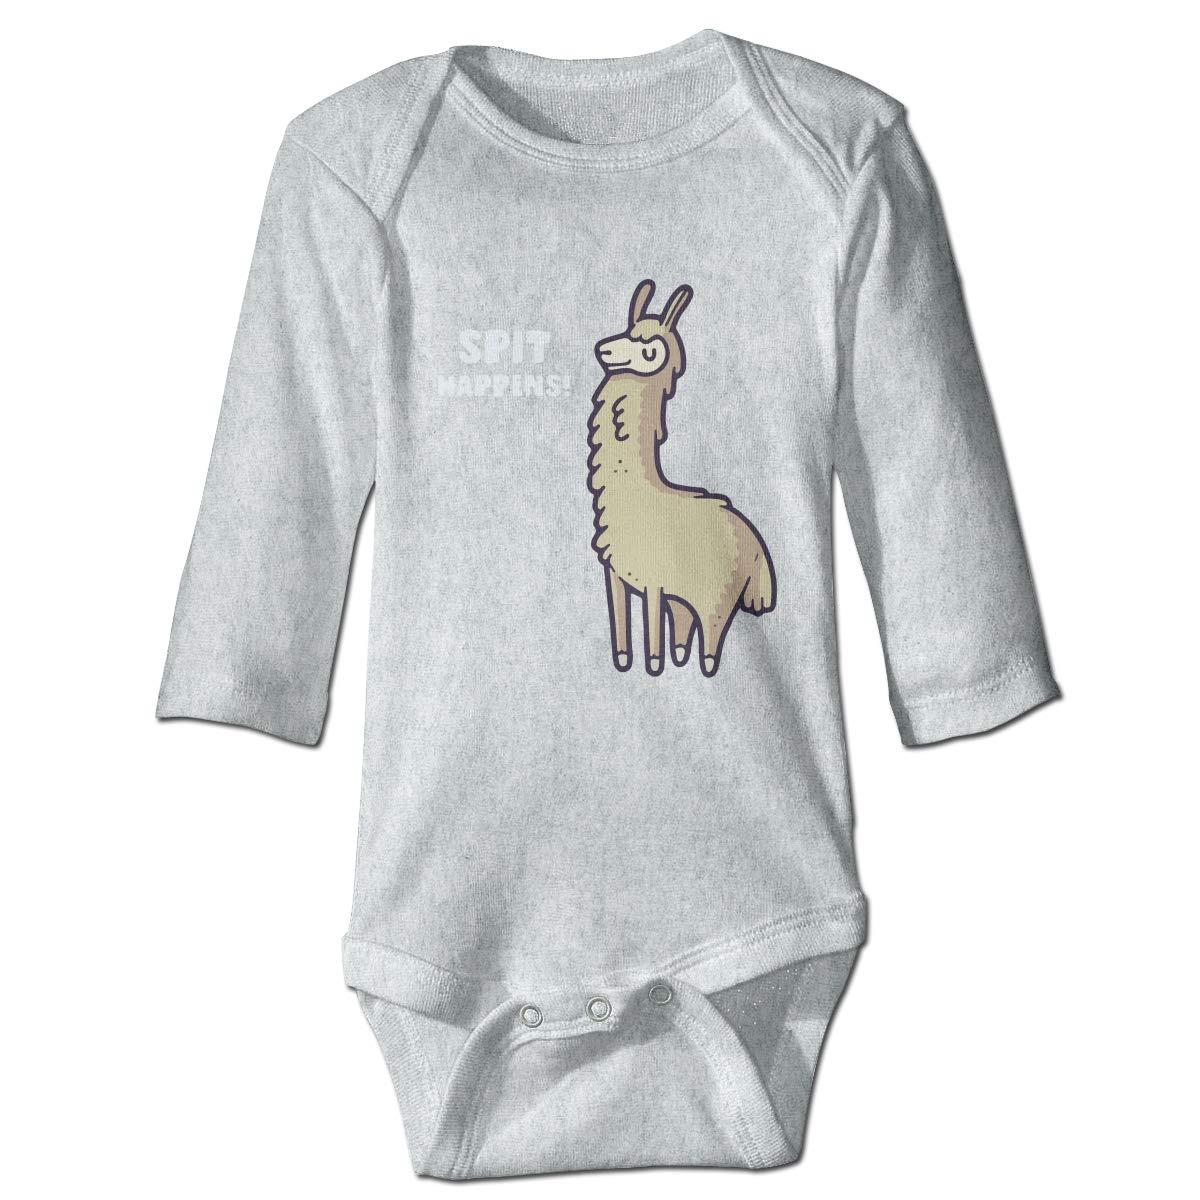 XHX Baby Spit Happens Alpaca Llama Long Sleeve Romper Onesie Bodysuit Jumpsuit